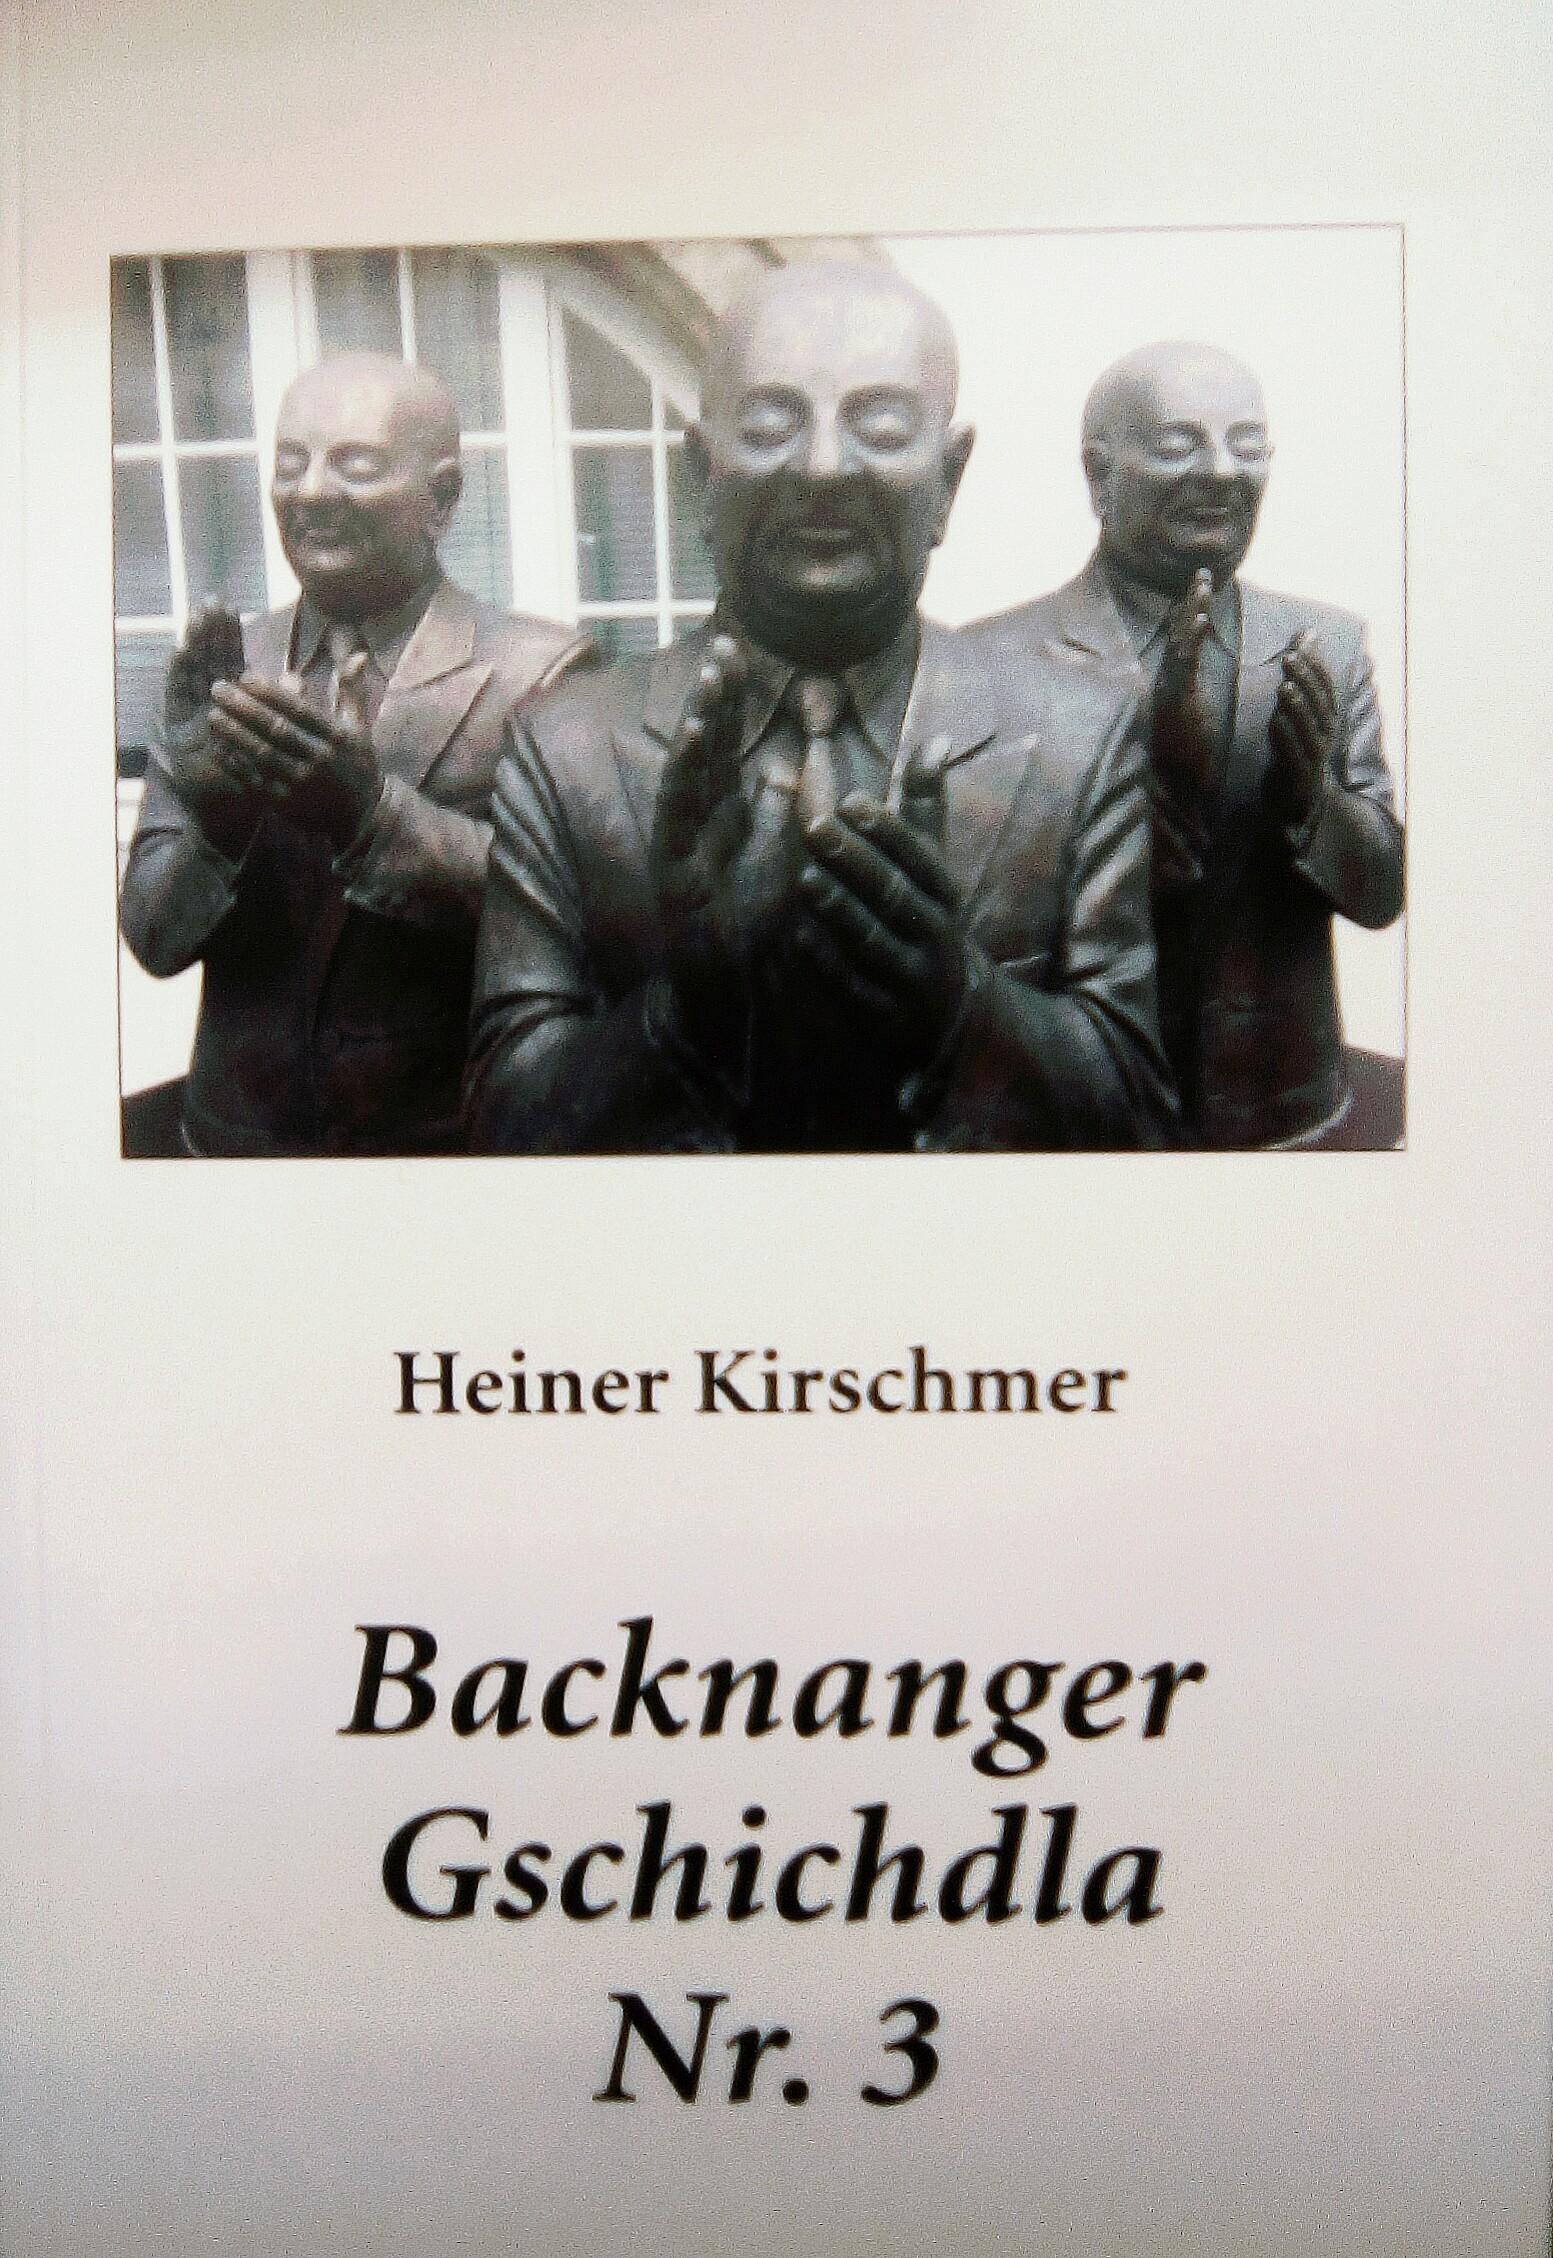 Backnanger Gschichdla Nr. 3